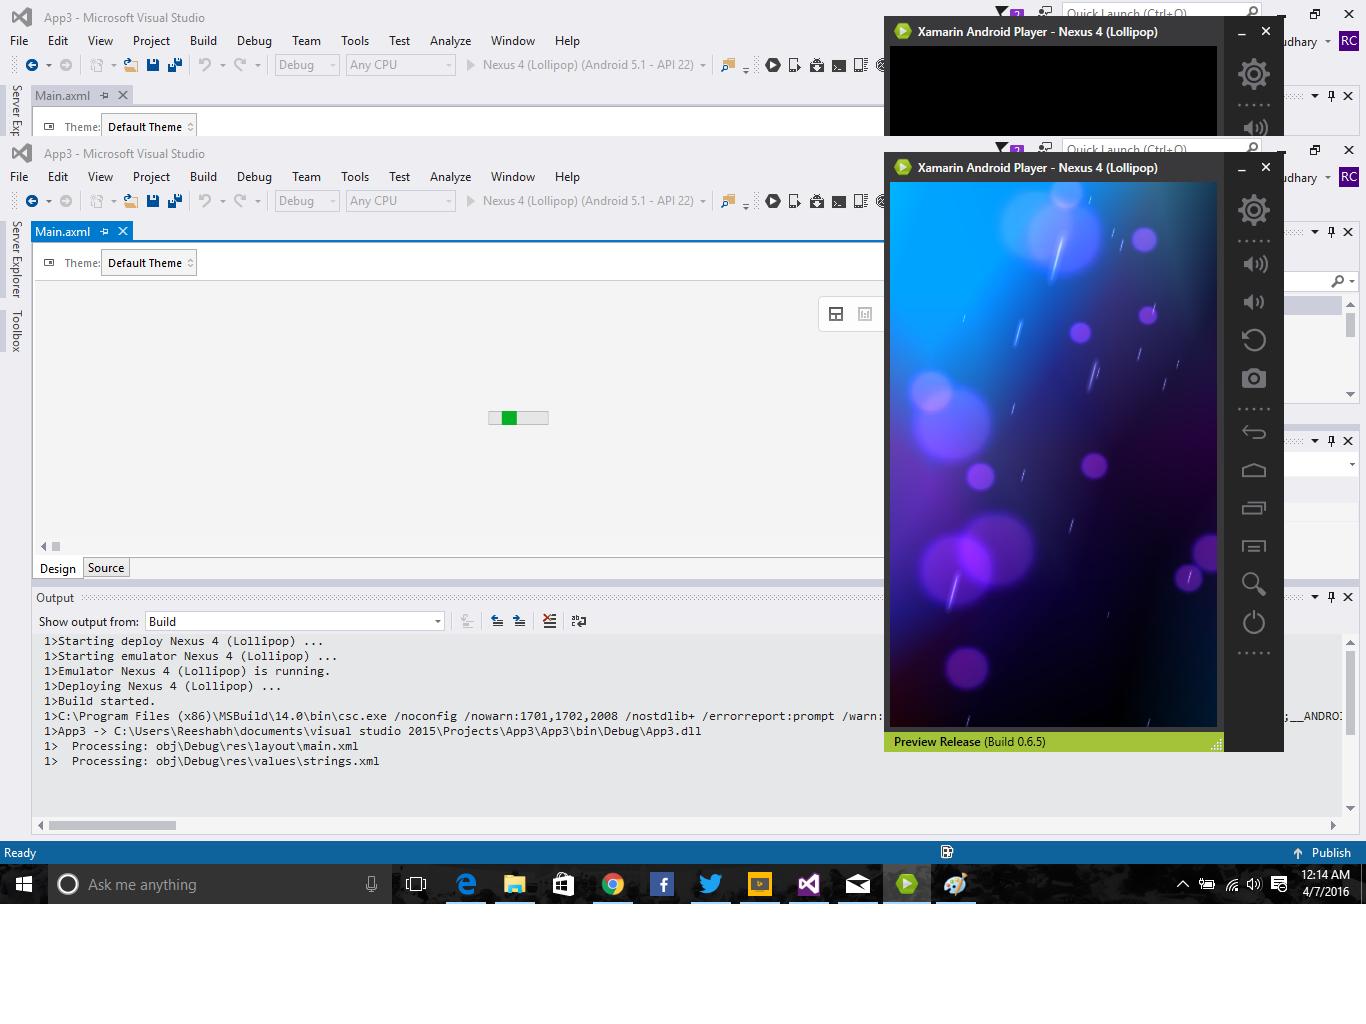 Developing App Xamarin